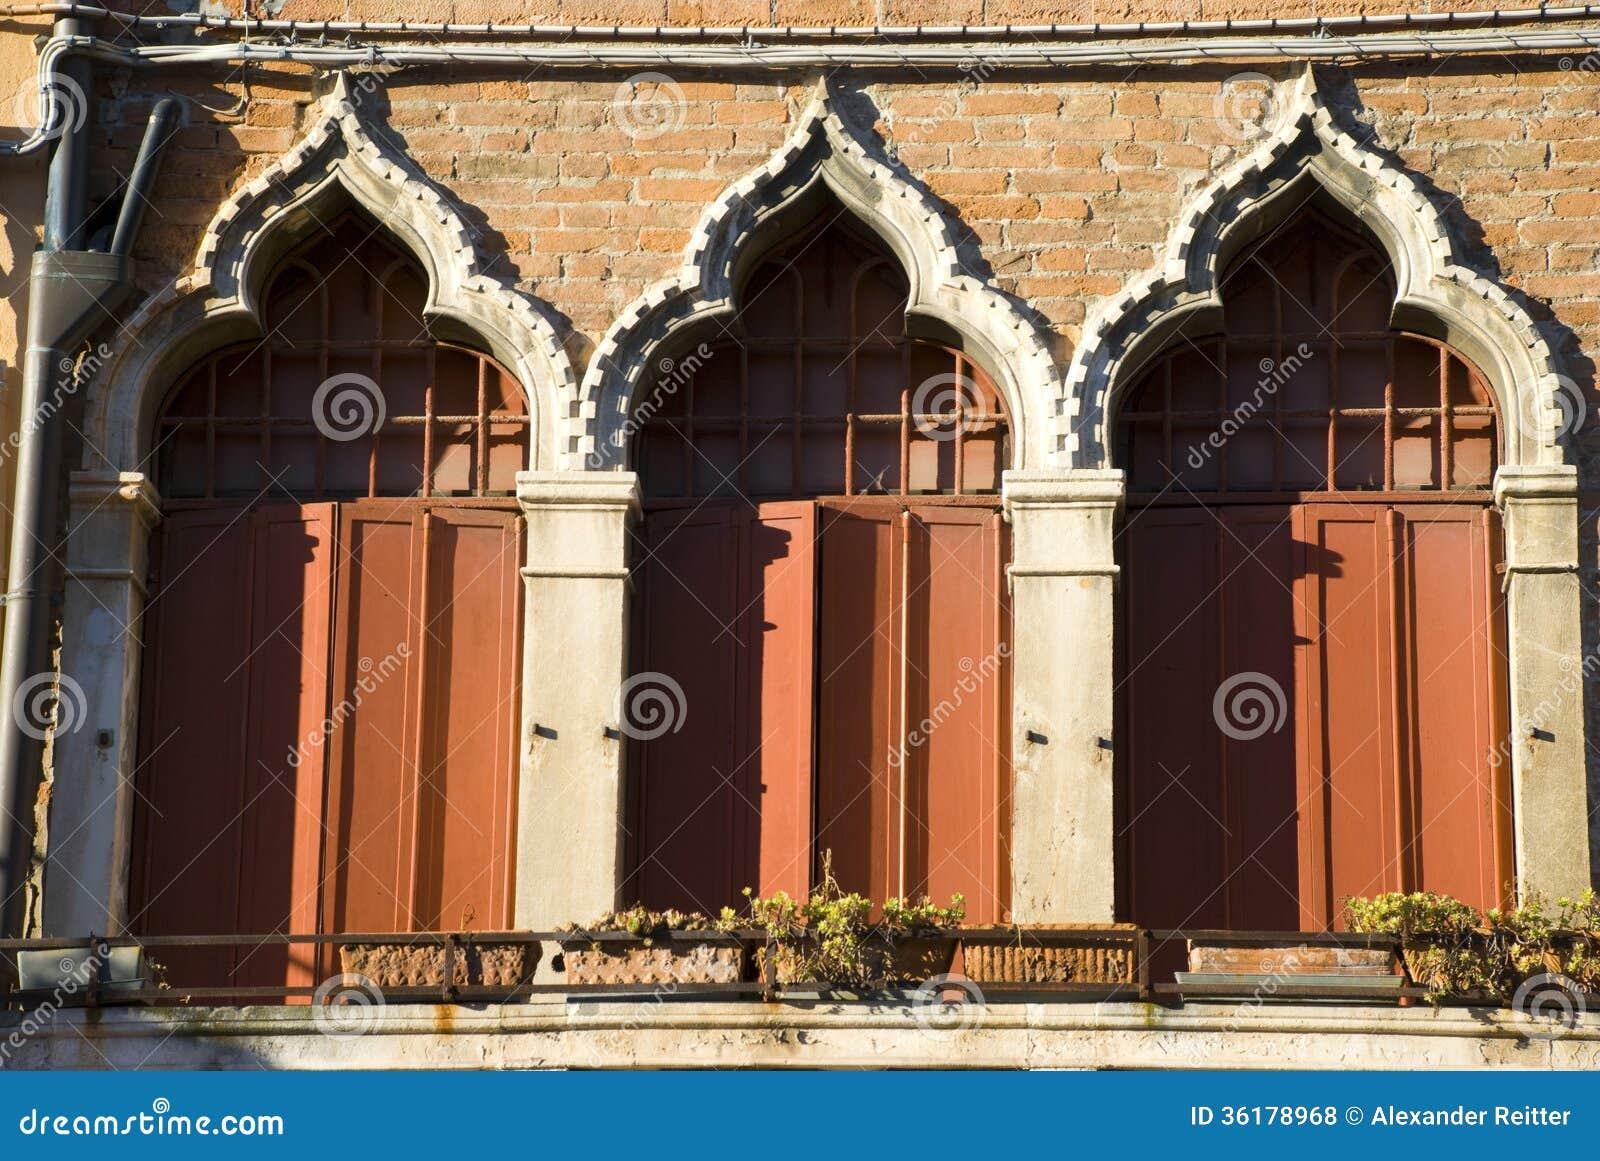 Finestre veneziane rosse italia fotografia stock - Veneziane per finestre prezzi ...